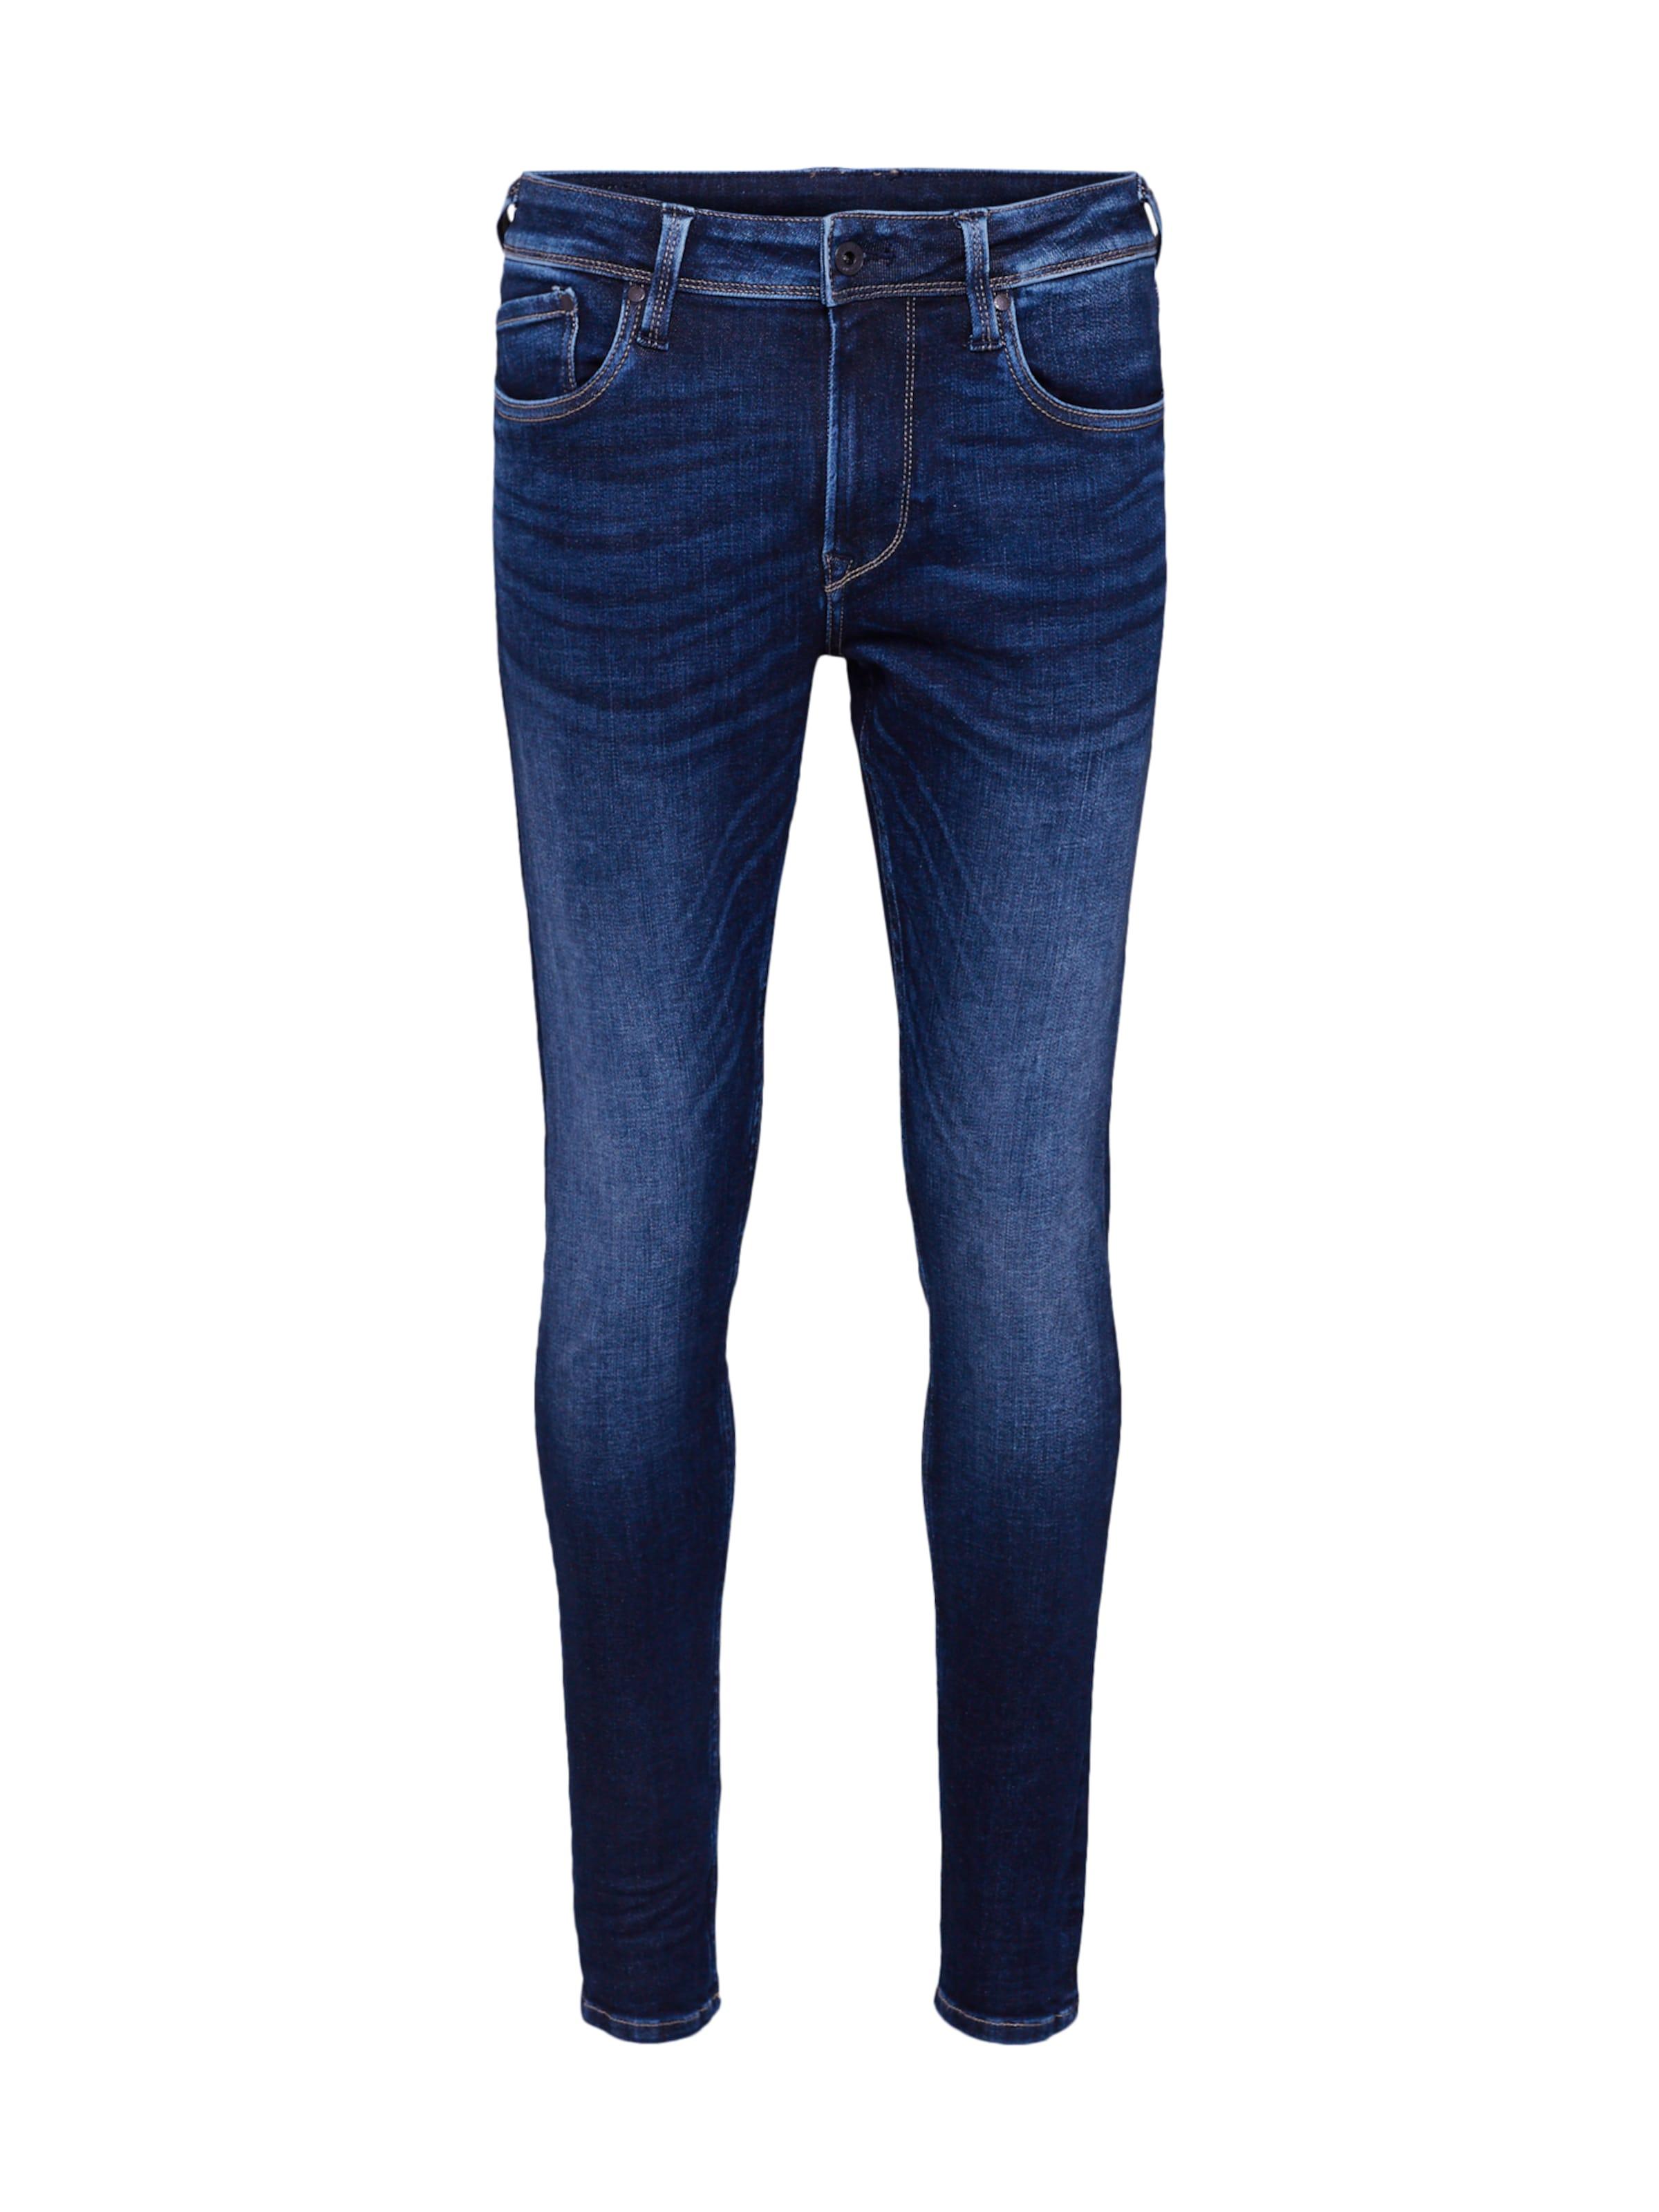 Jean Pepe 'finsbury' Bleu Denim Jeans En xrCBWedo